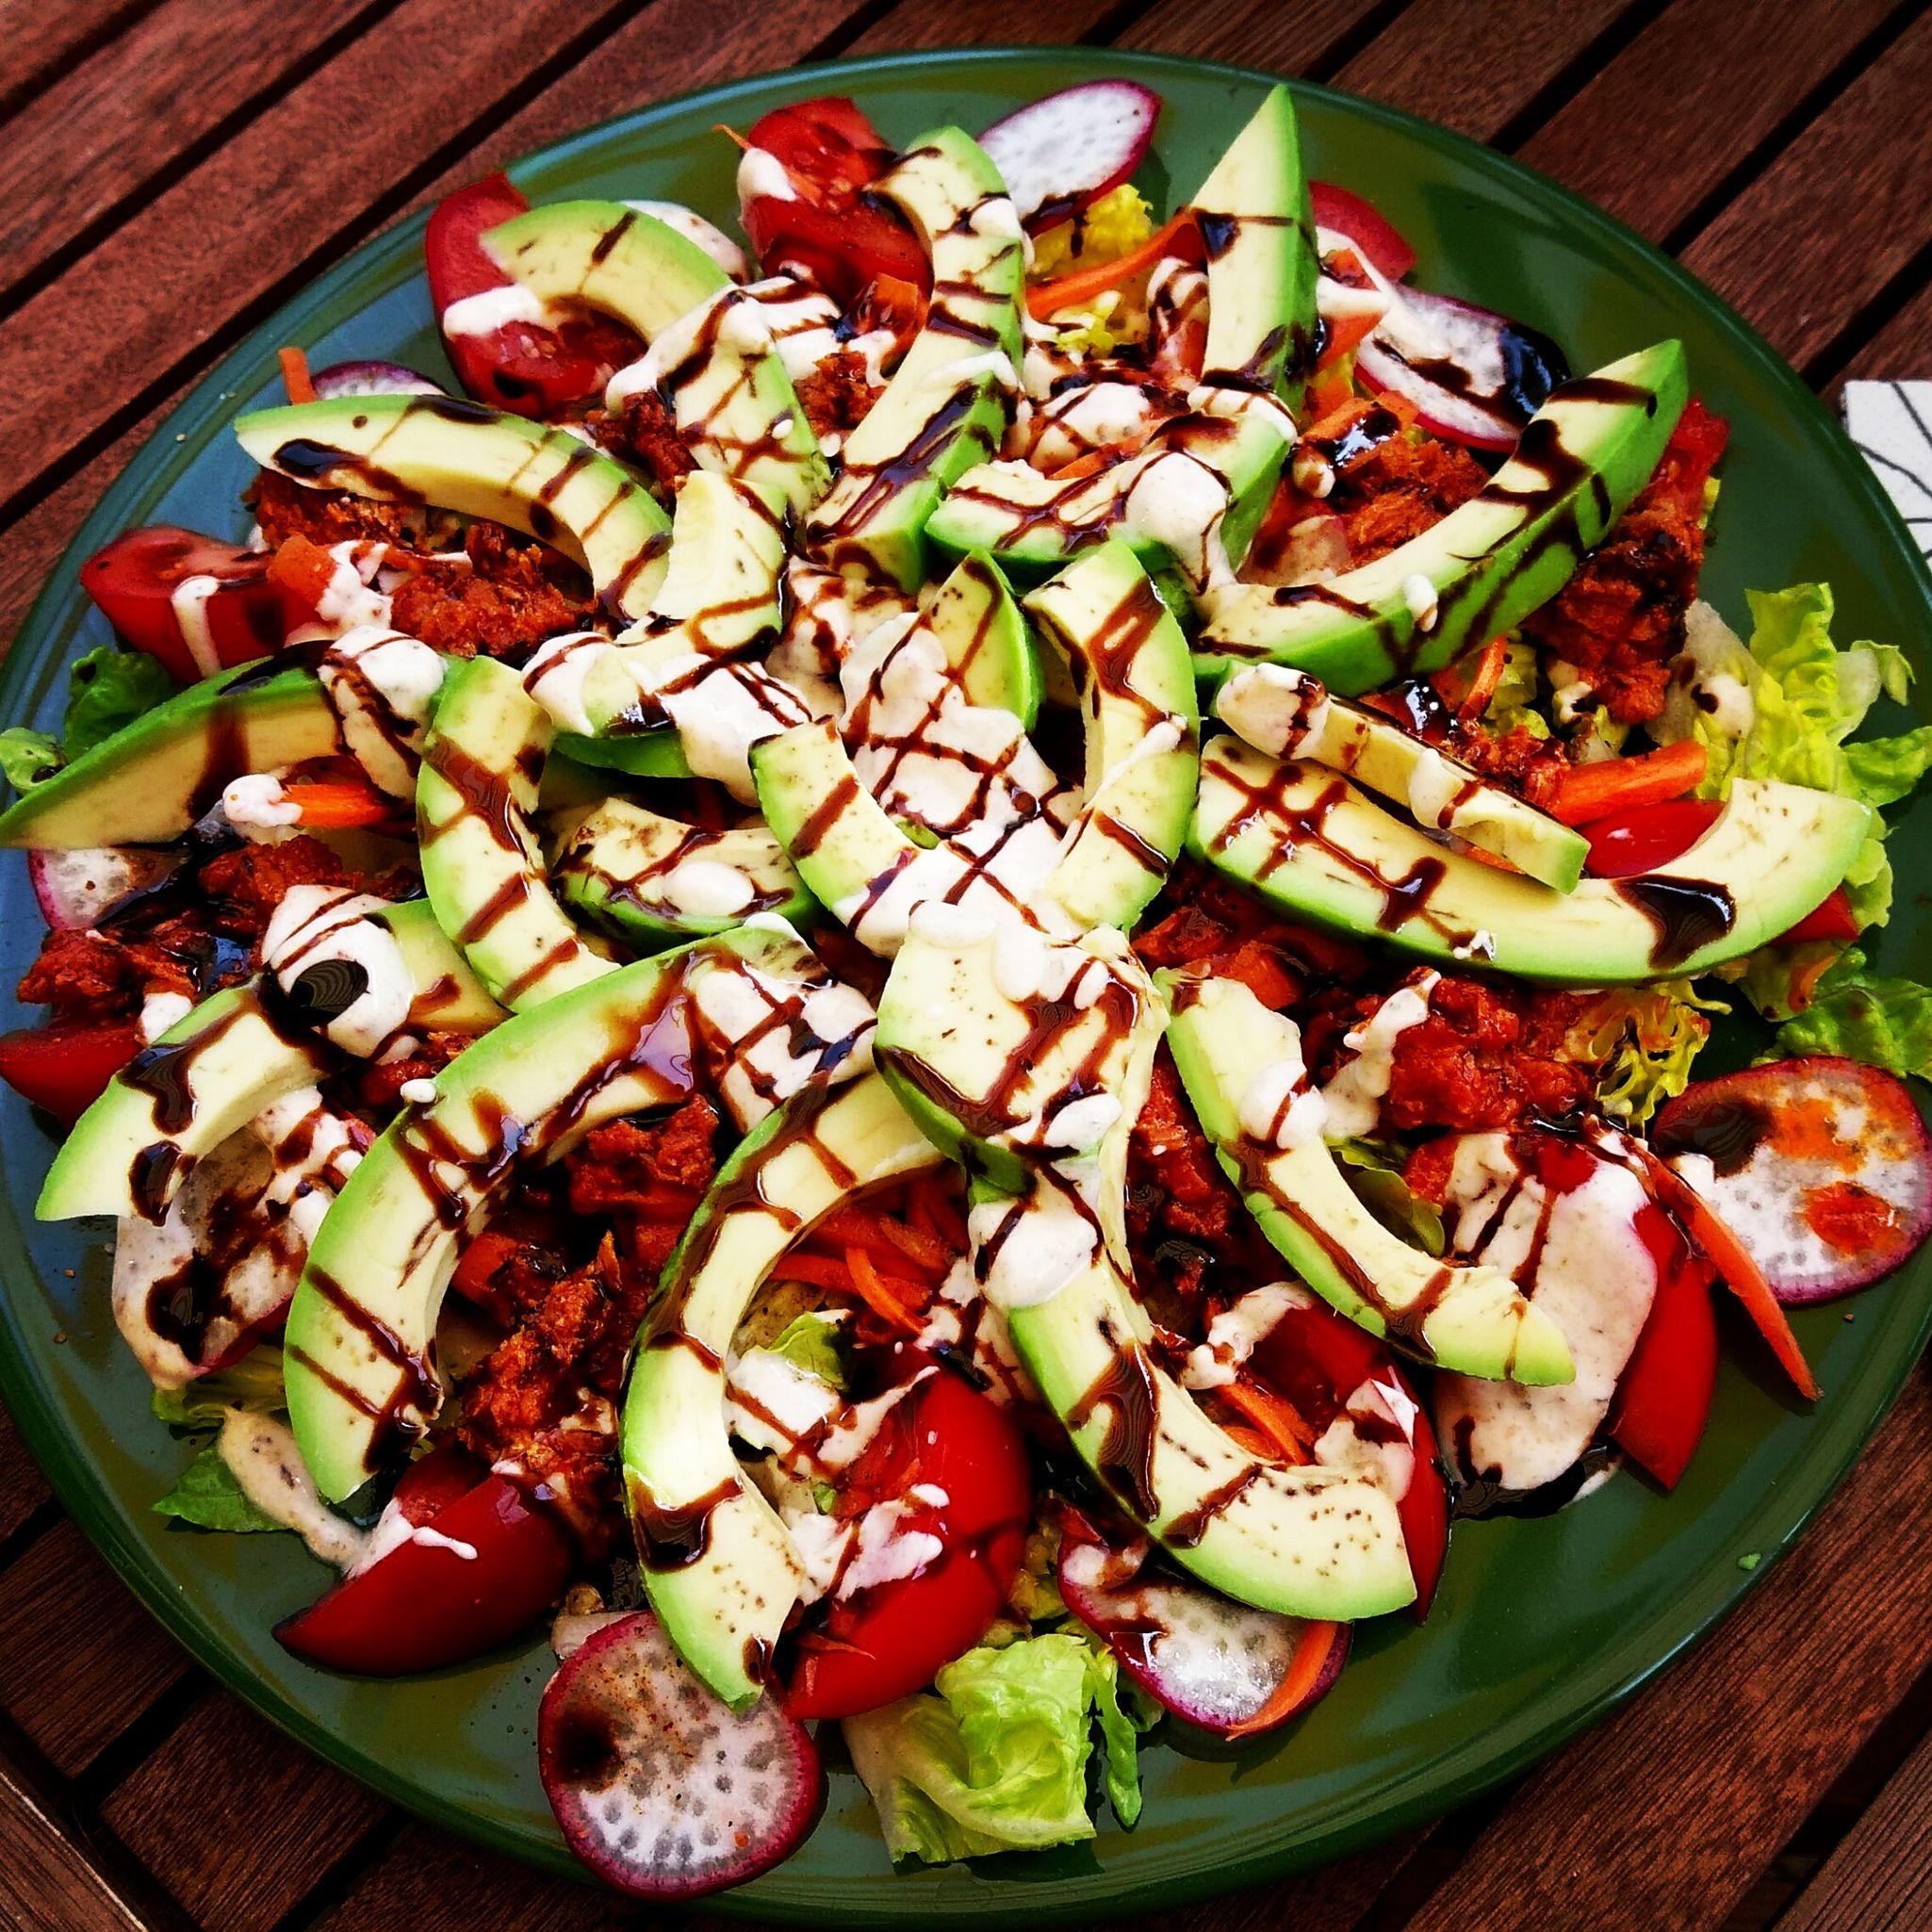 My Favorite Salad Soyummy Salad Salad Bowl Salad Time Lovesalads Salad Days Tuna Salad Avocado Salad Avocadoaddicted